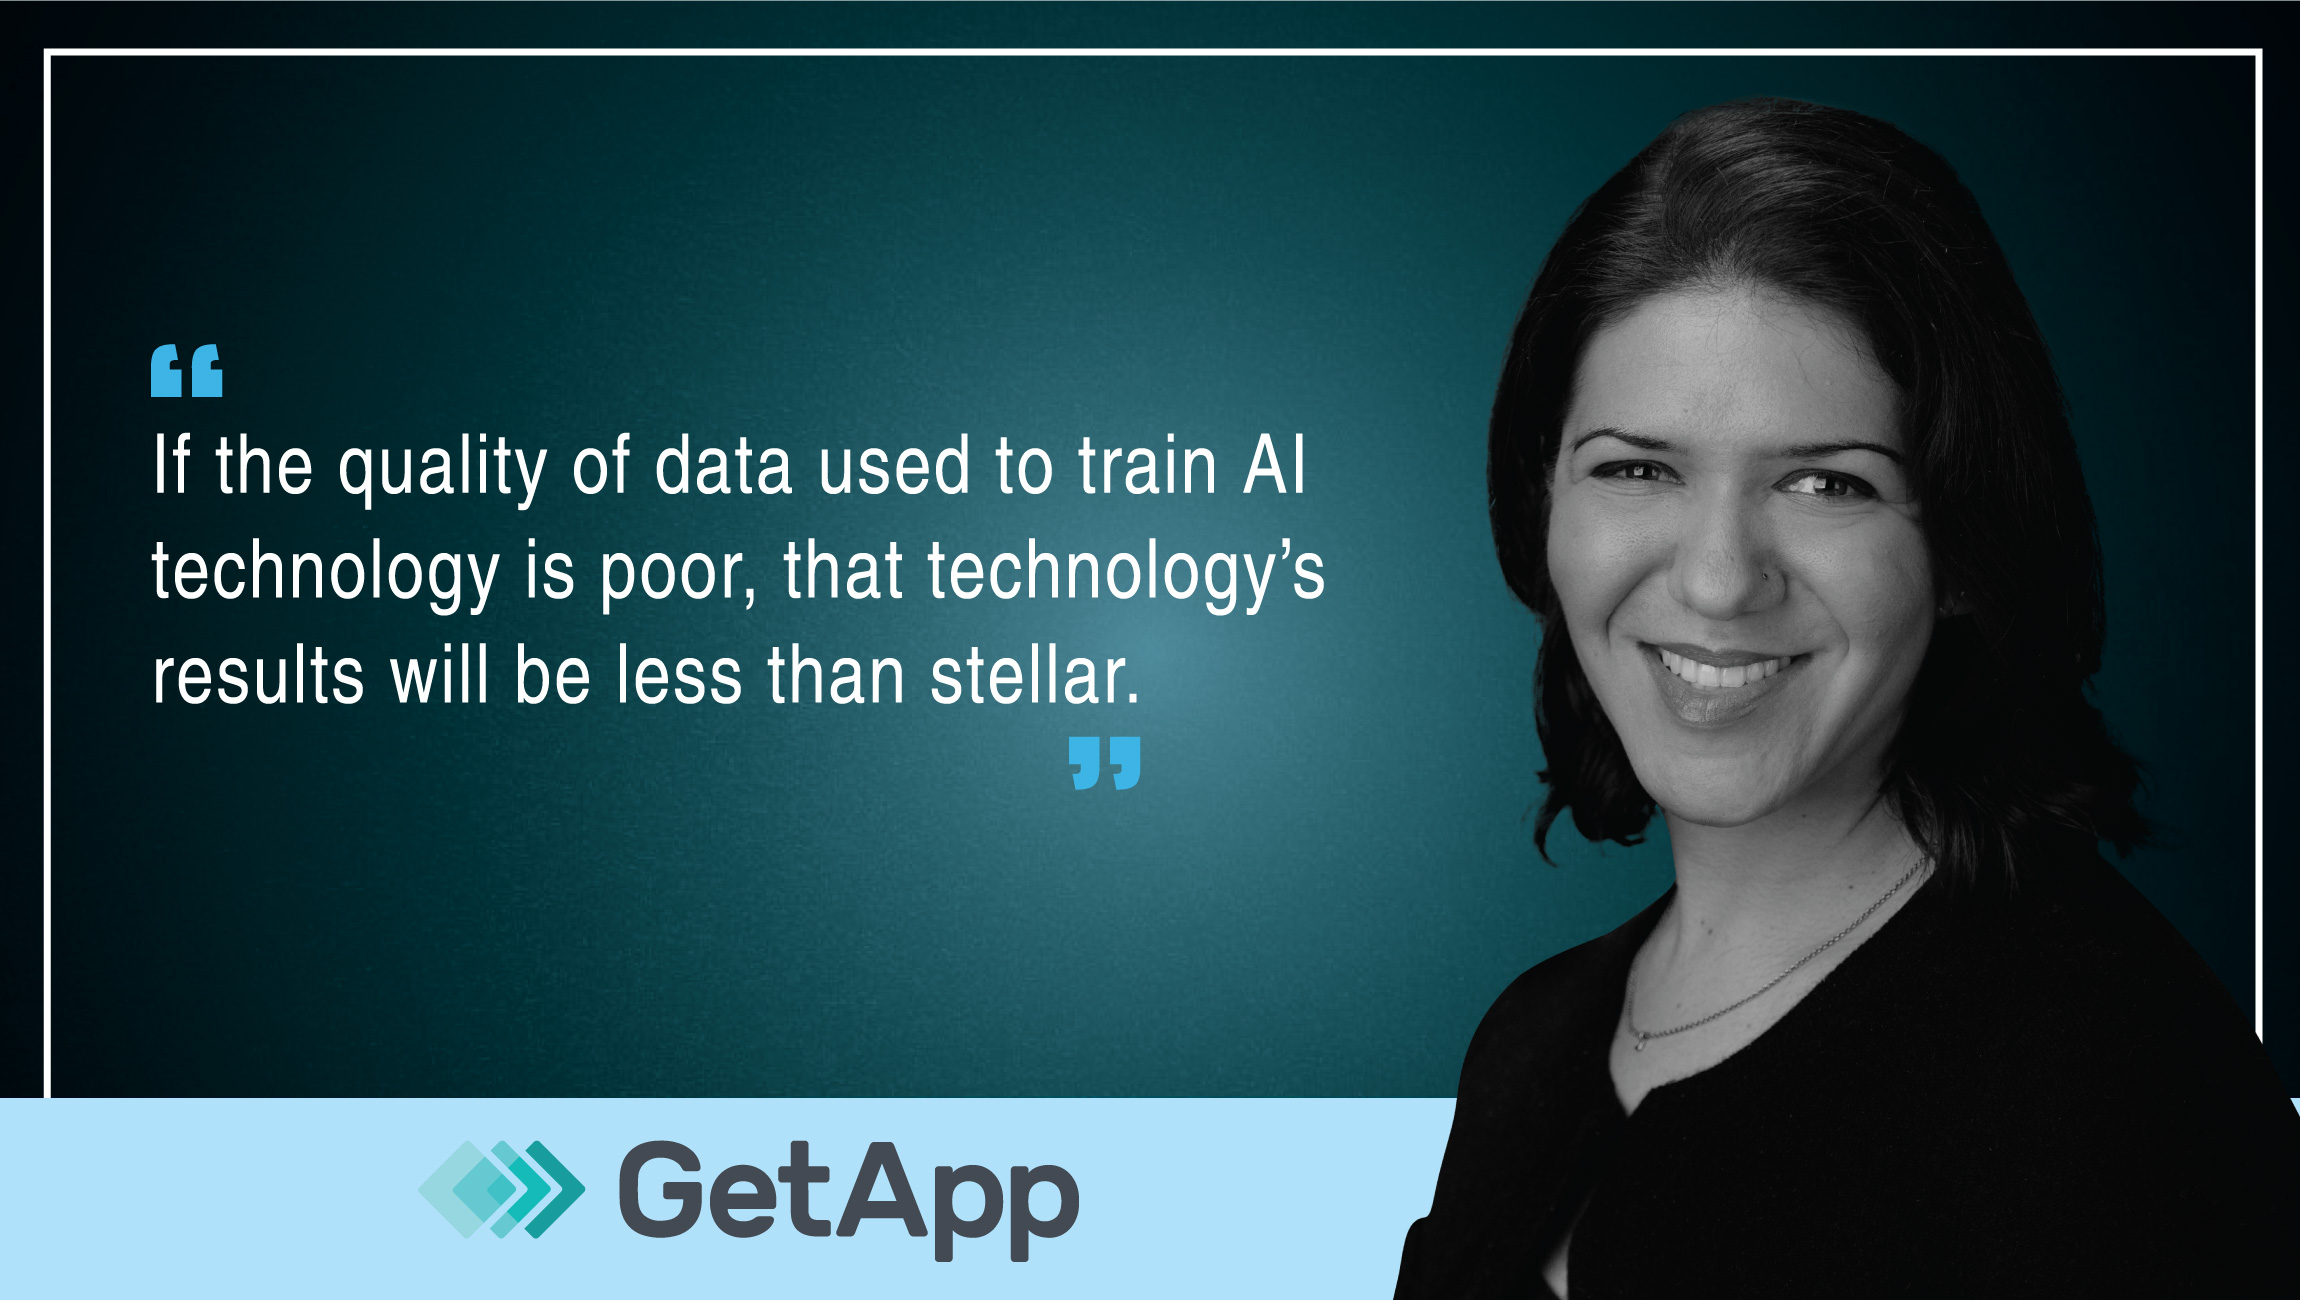 TechBytes with Lauren Maffeo, Associate Principal Analyst at GetApp